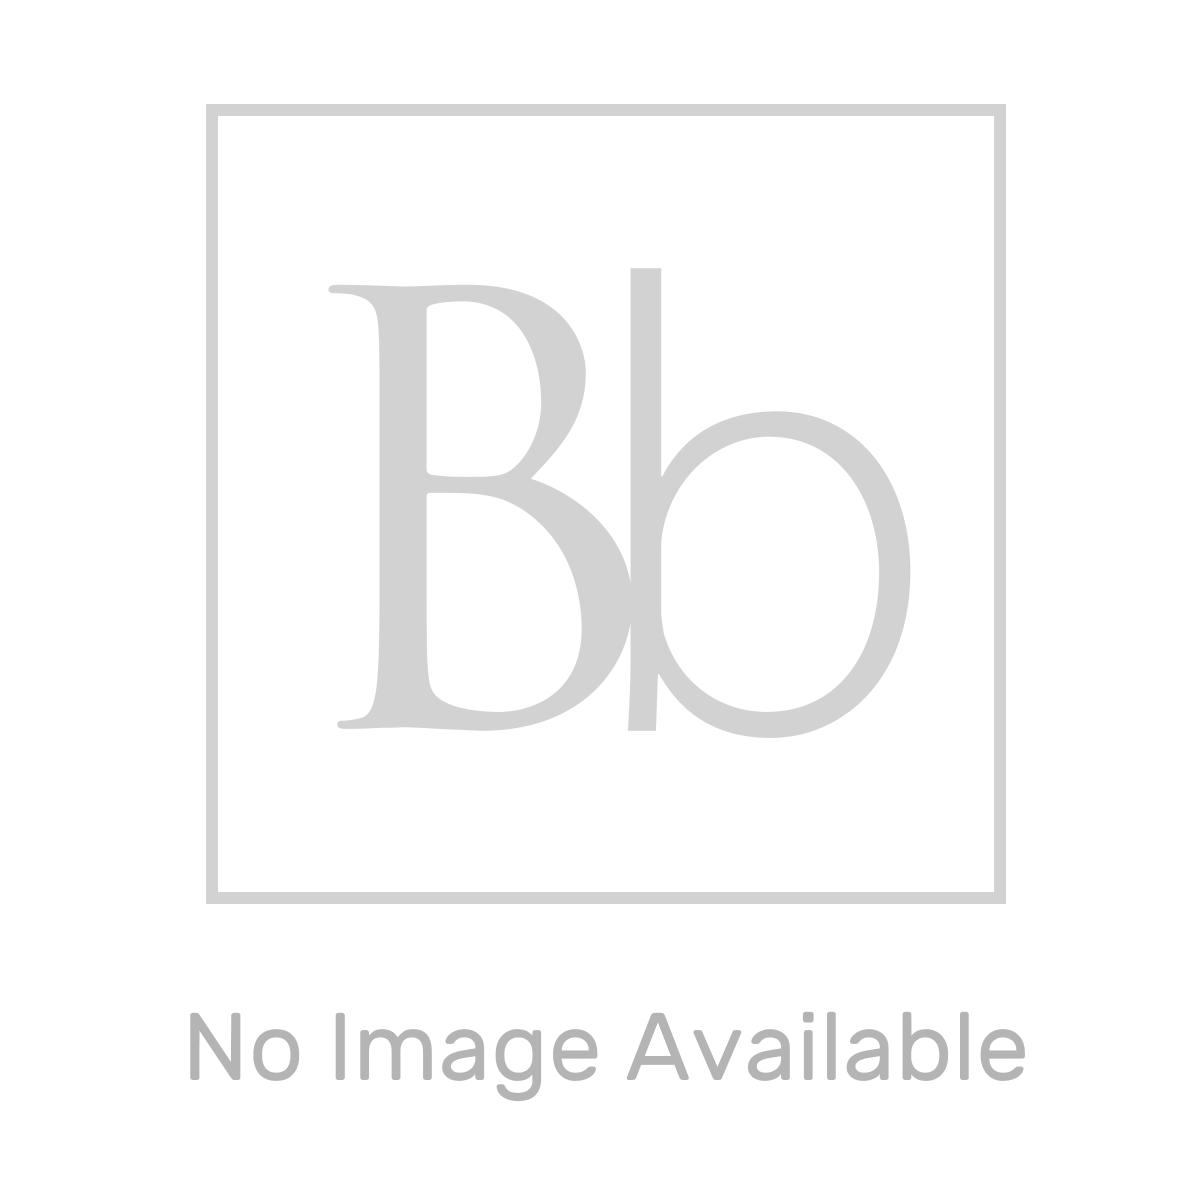 Nuie Athena Grey Avola 2 Drawer Floor Standing Vanity Unit with 18mm Worktop 600mm Line Drawing